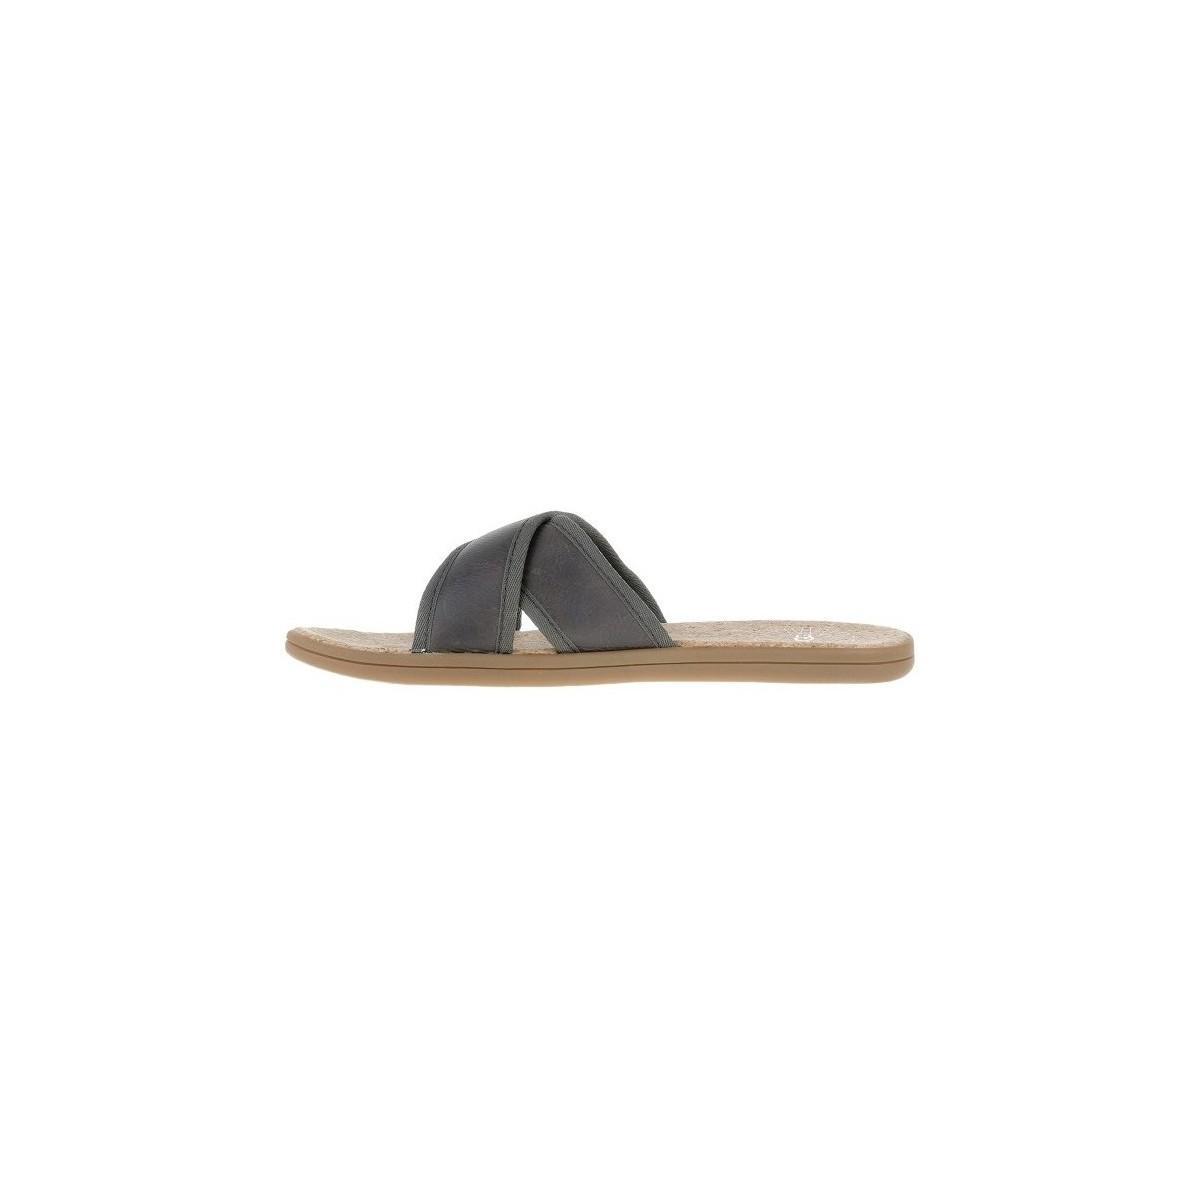 7df2ead009a UGG Seaside Slike Men's Sandals In Multicolour for Men - Lyst